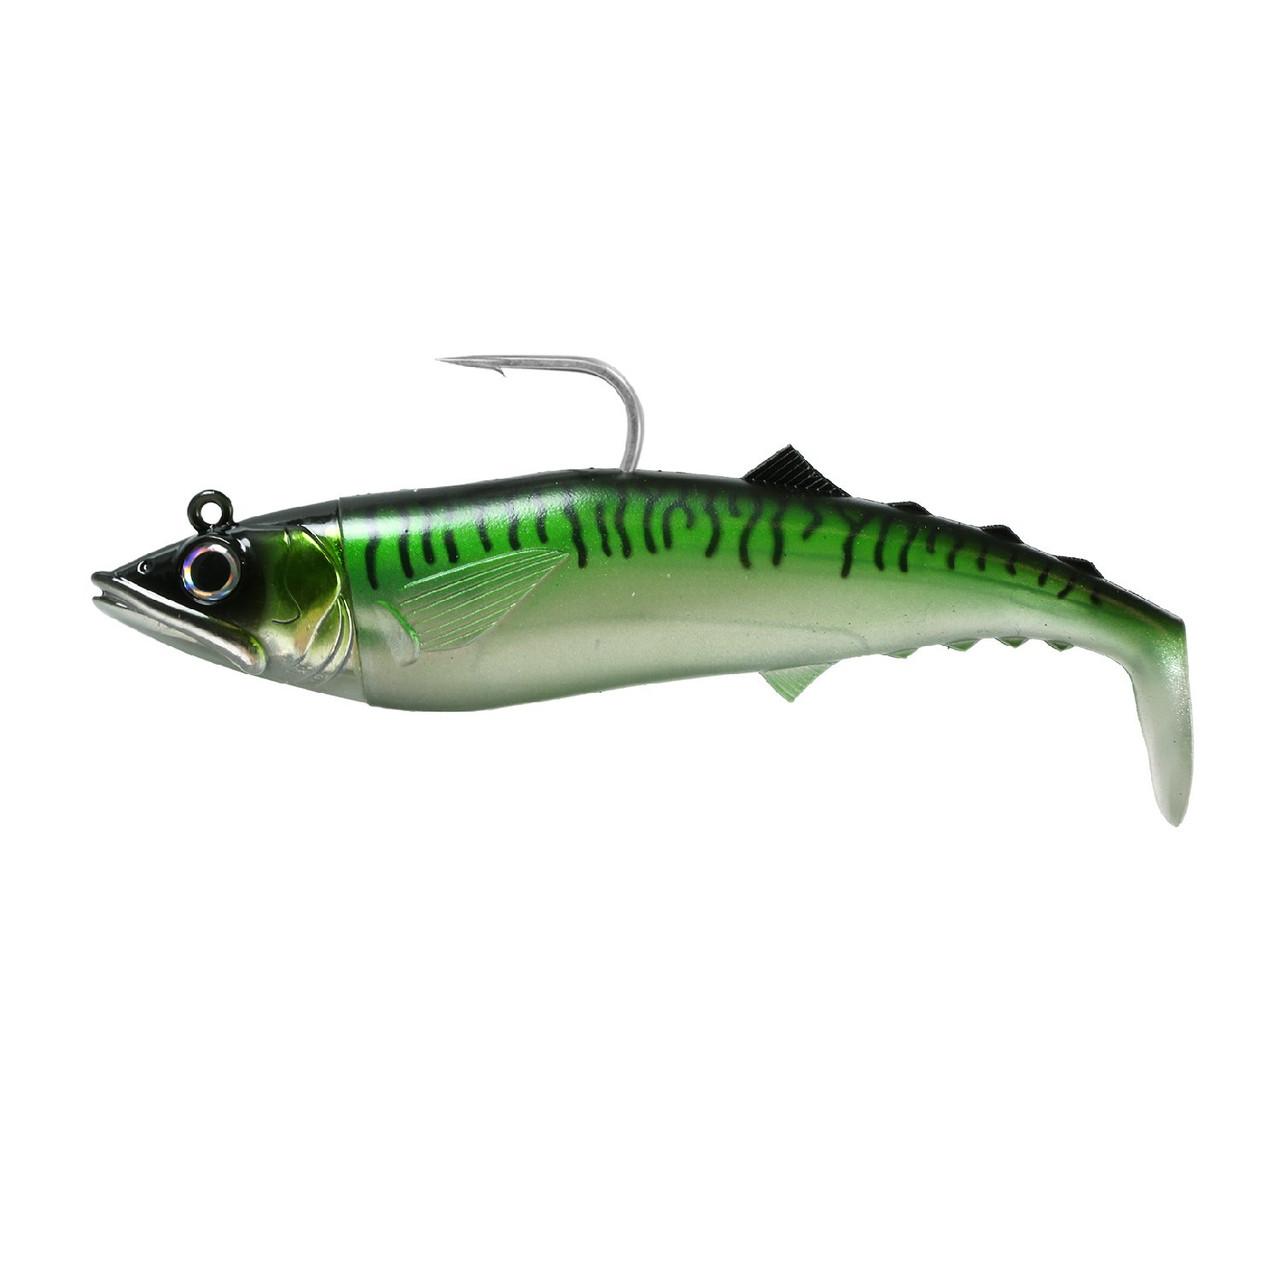 "FishLab Mack Attack Soft Shad 6.5"" 5.5oz Green Mack"